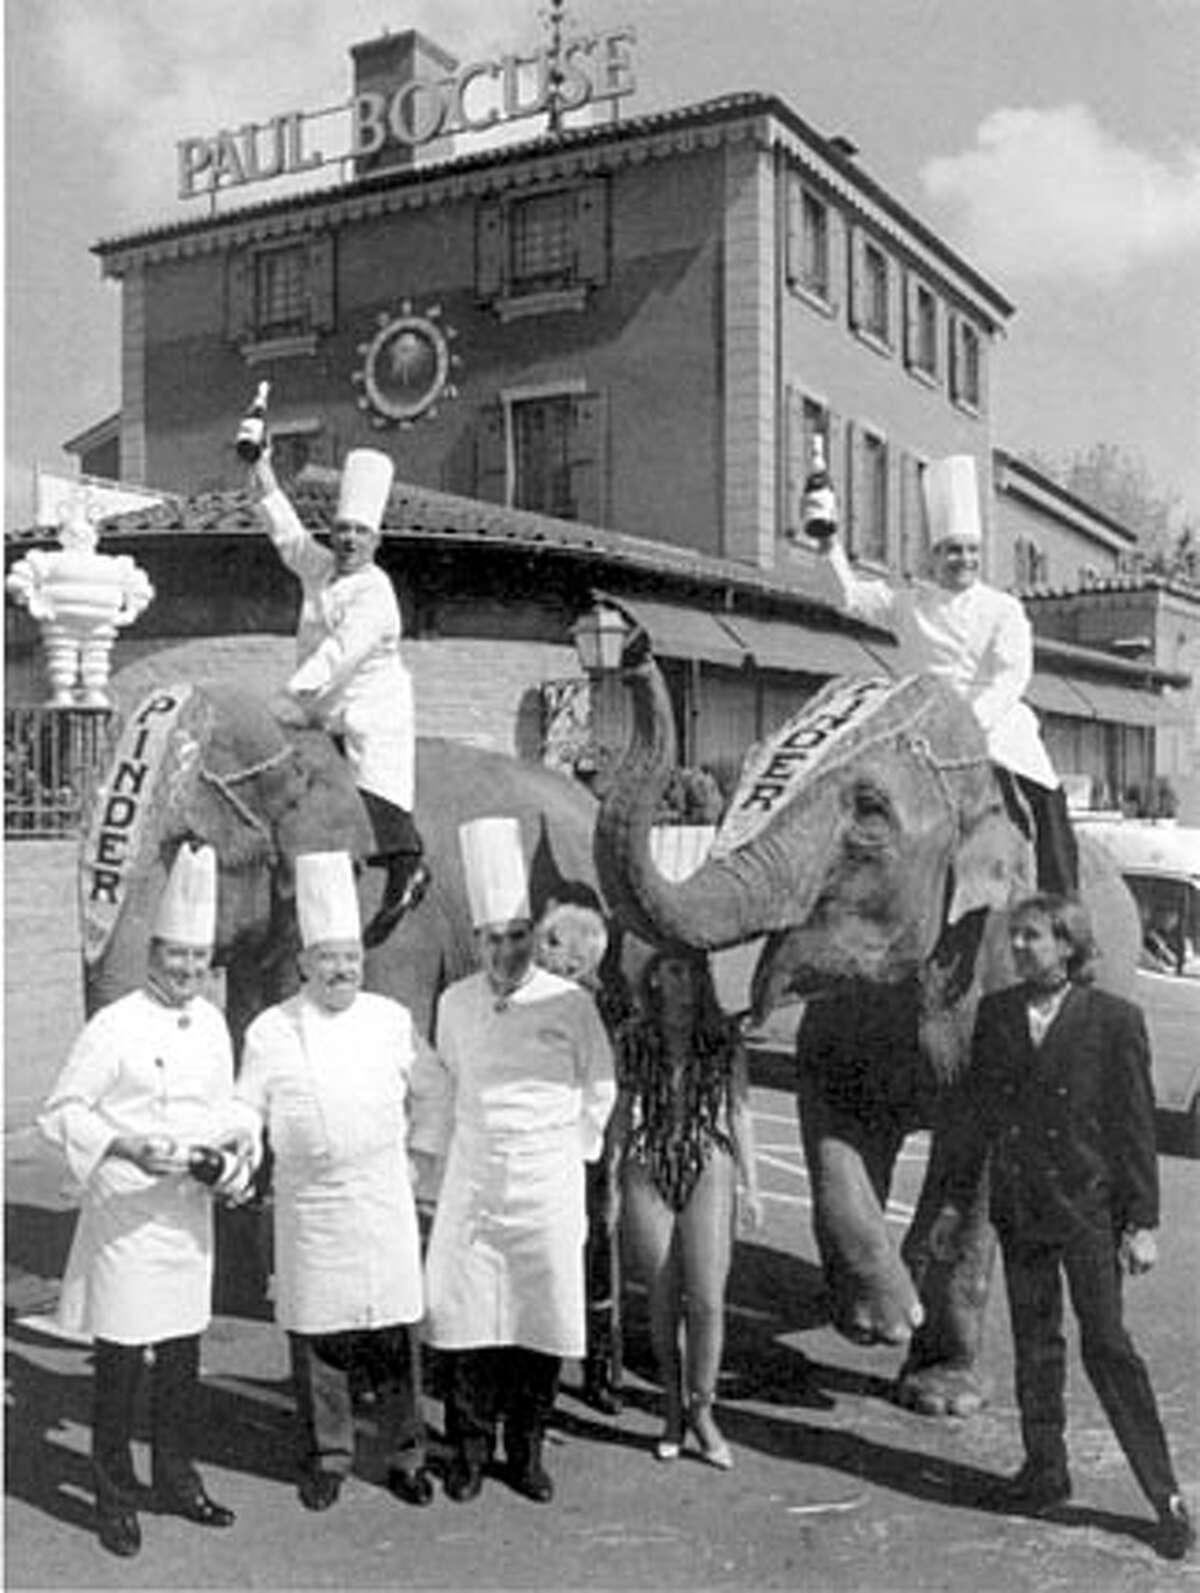 Bernard Loiseau (right elephant) and Paul Bouise (left elephant) celebrate Loiseau's winning a third Michelin star.